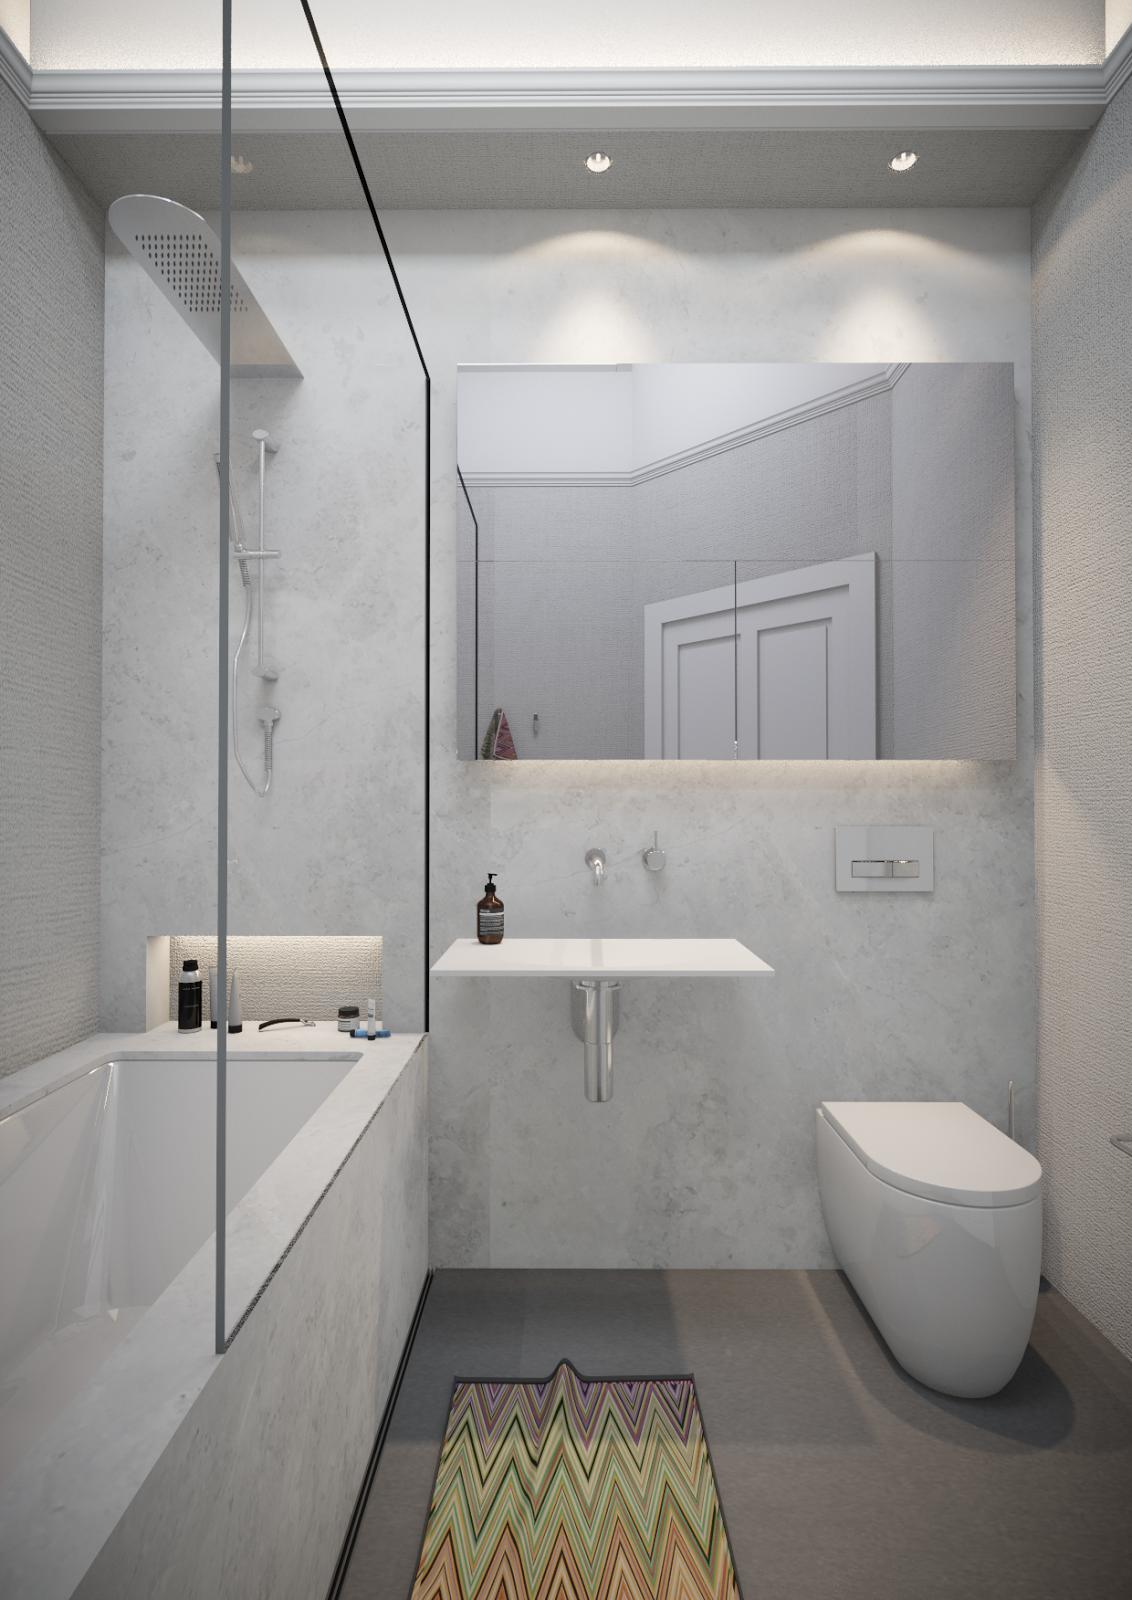 Modern Kitchen And Bathroom Design Solutions Award Winning Design Studio For The Kitchen Bathroom Hand Small Bathroom Design Bathroom Design Small Bathroom